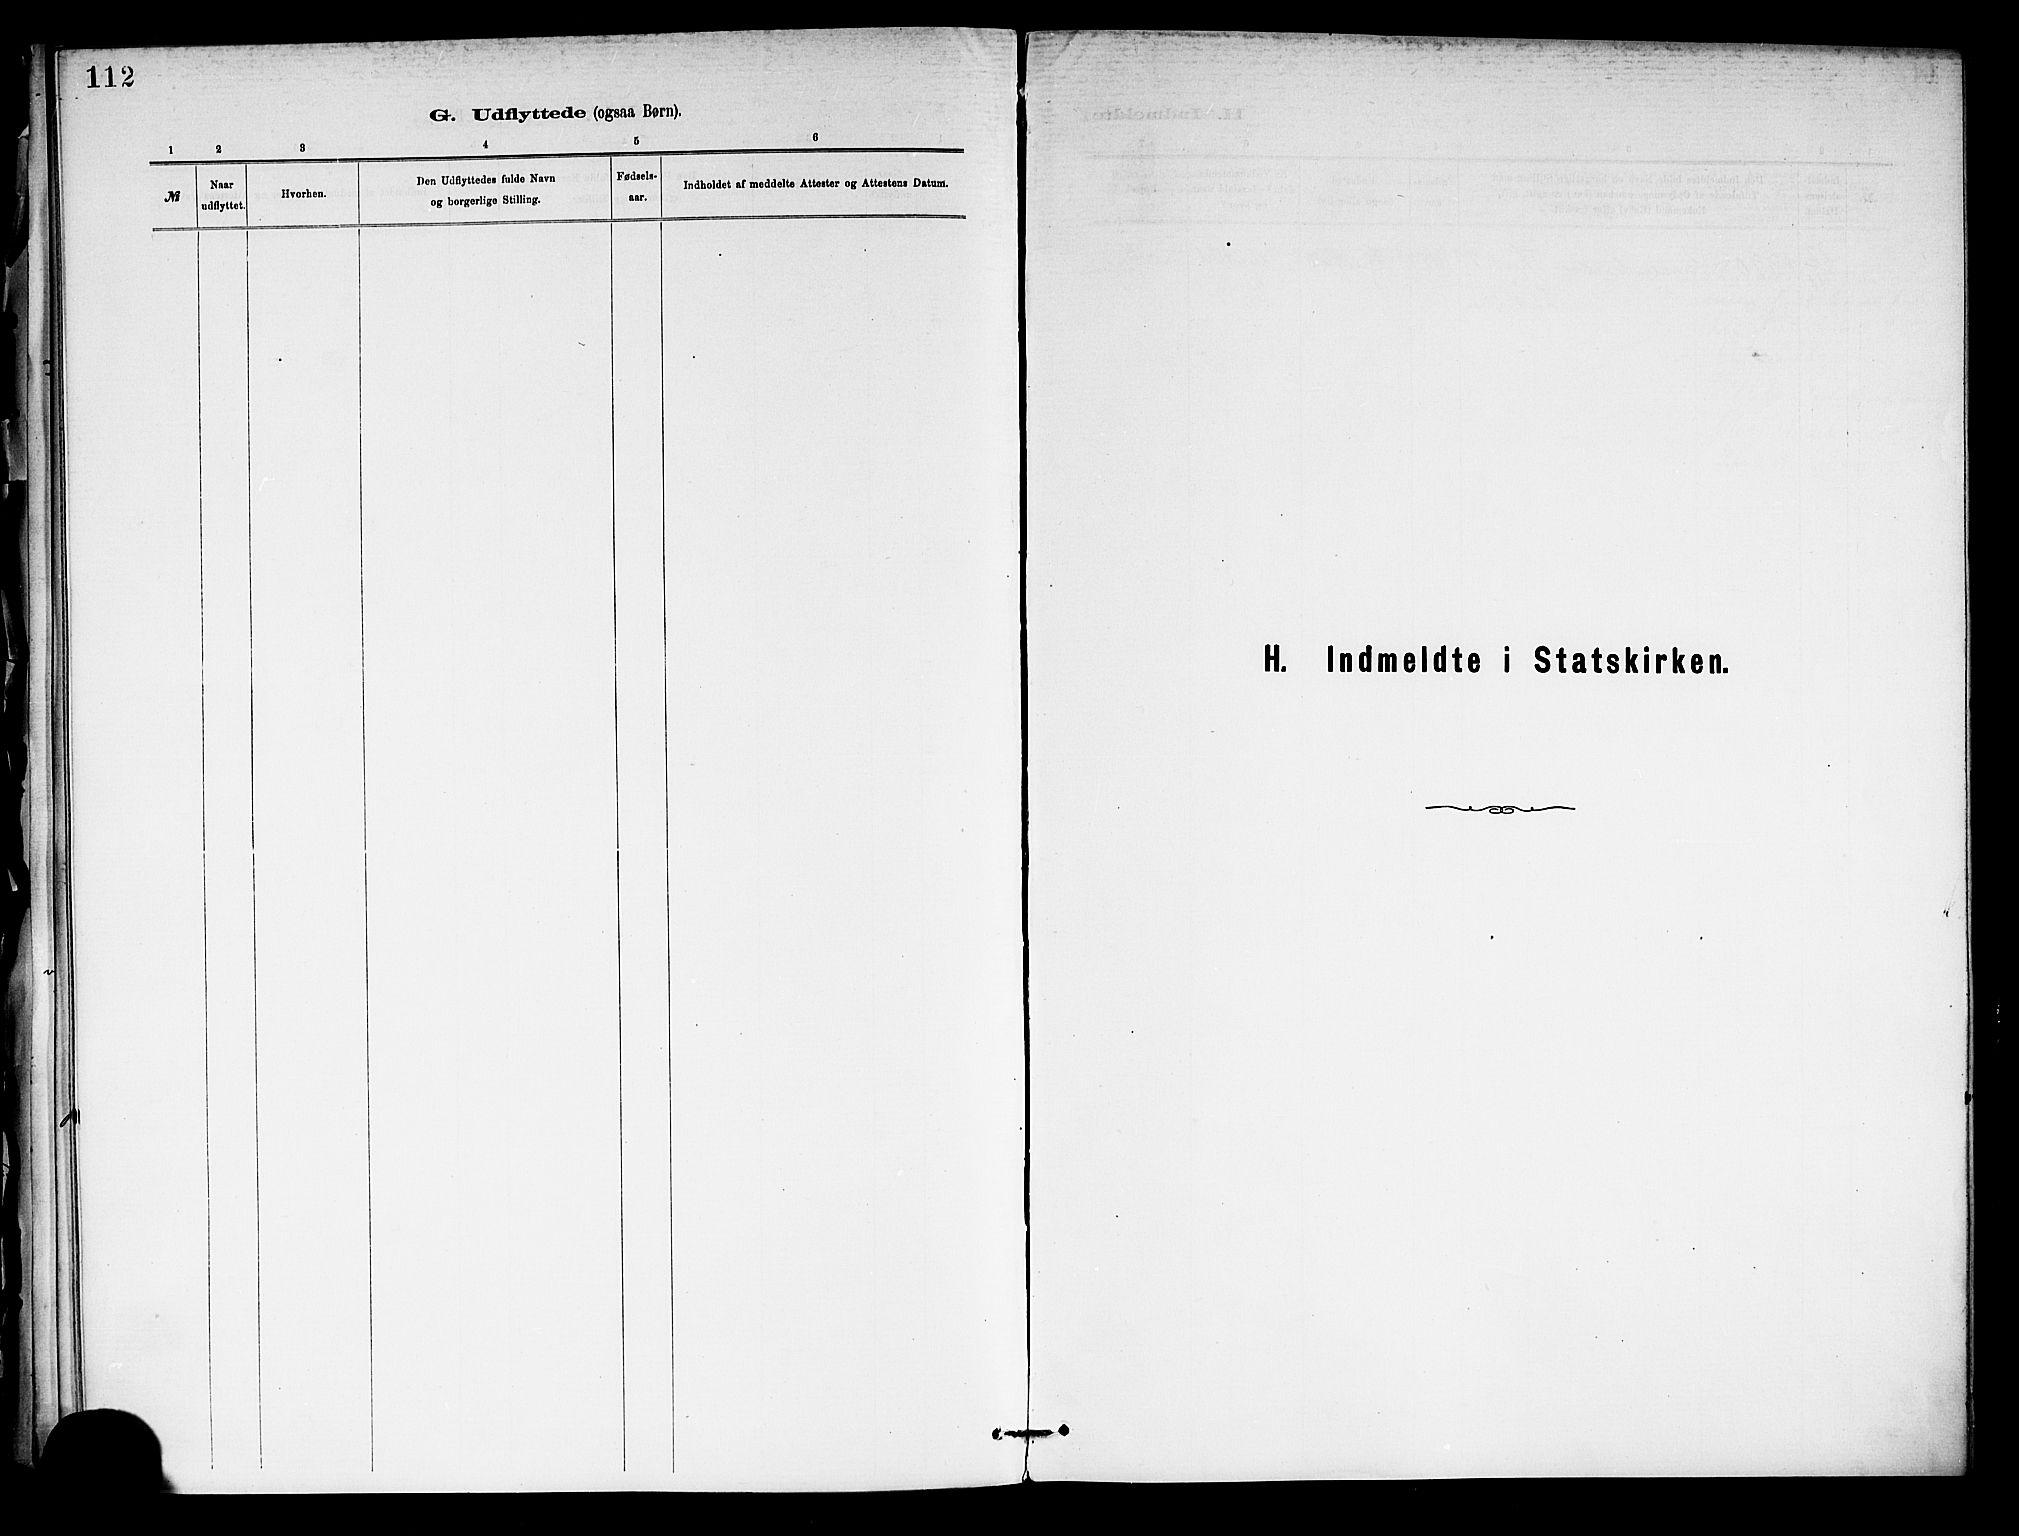 SAKO, Holla kirkebøker, F/Fa/L0009: Ministerialbok nr. 9, 1881-1897, s. 112